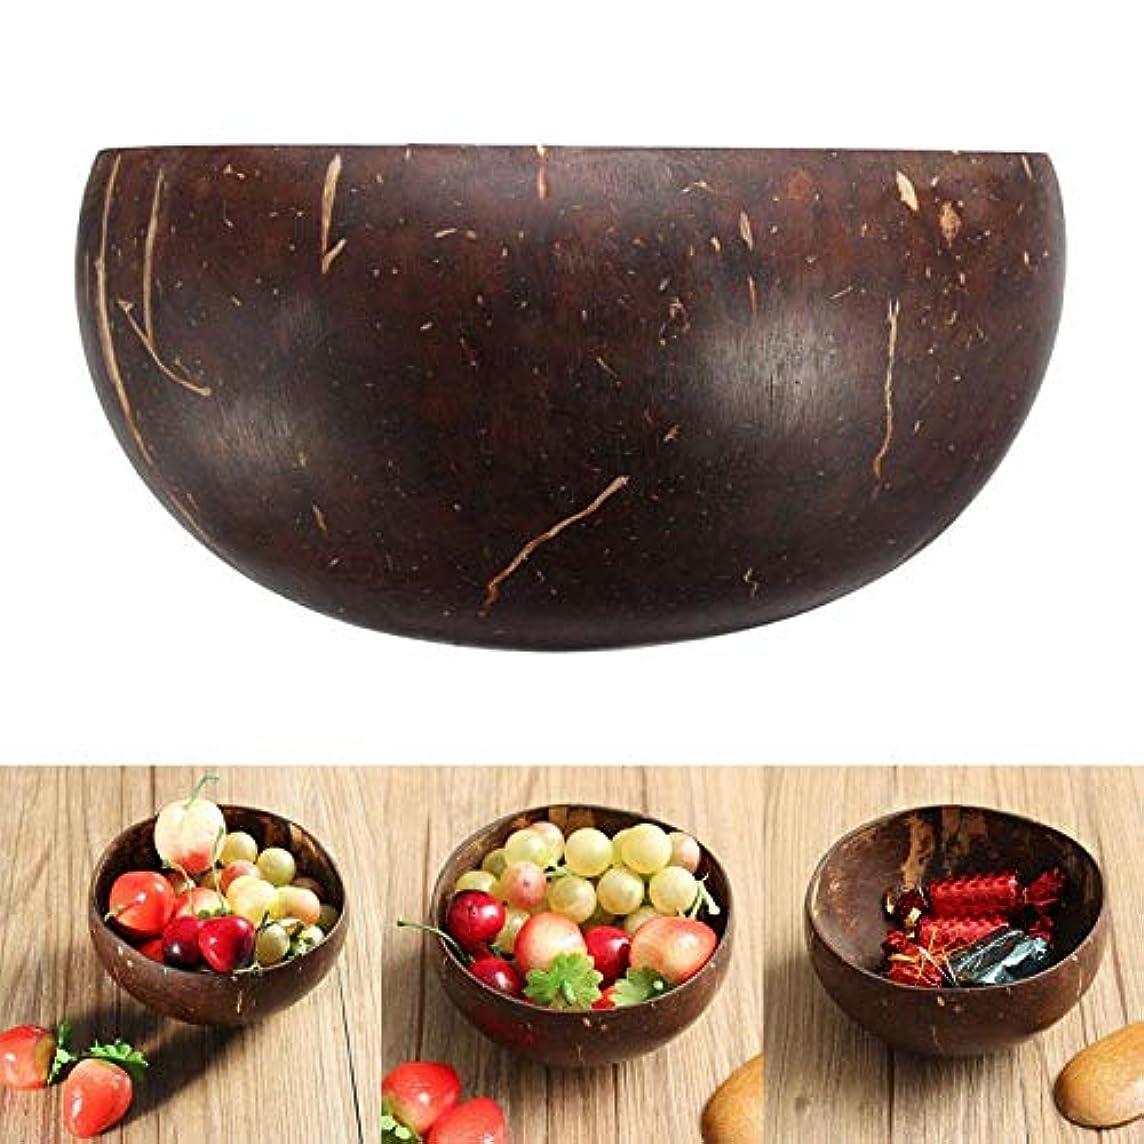 Bowl Decor - 1pc Vintage Natural Coconut Shell Bowl Eco Friendly Ice Cream Bowls Creative Fruit Handicraft Art - Fruit Spoon Organic Small Jumbo Cream Handmade Tableware Decor Bowls Wave Coconut